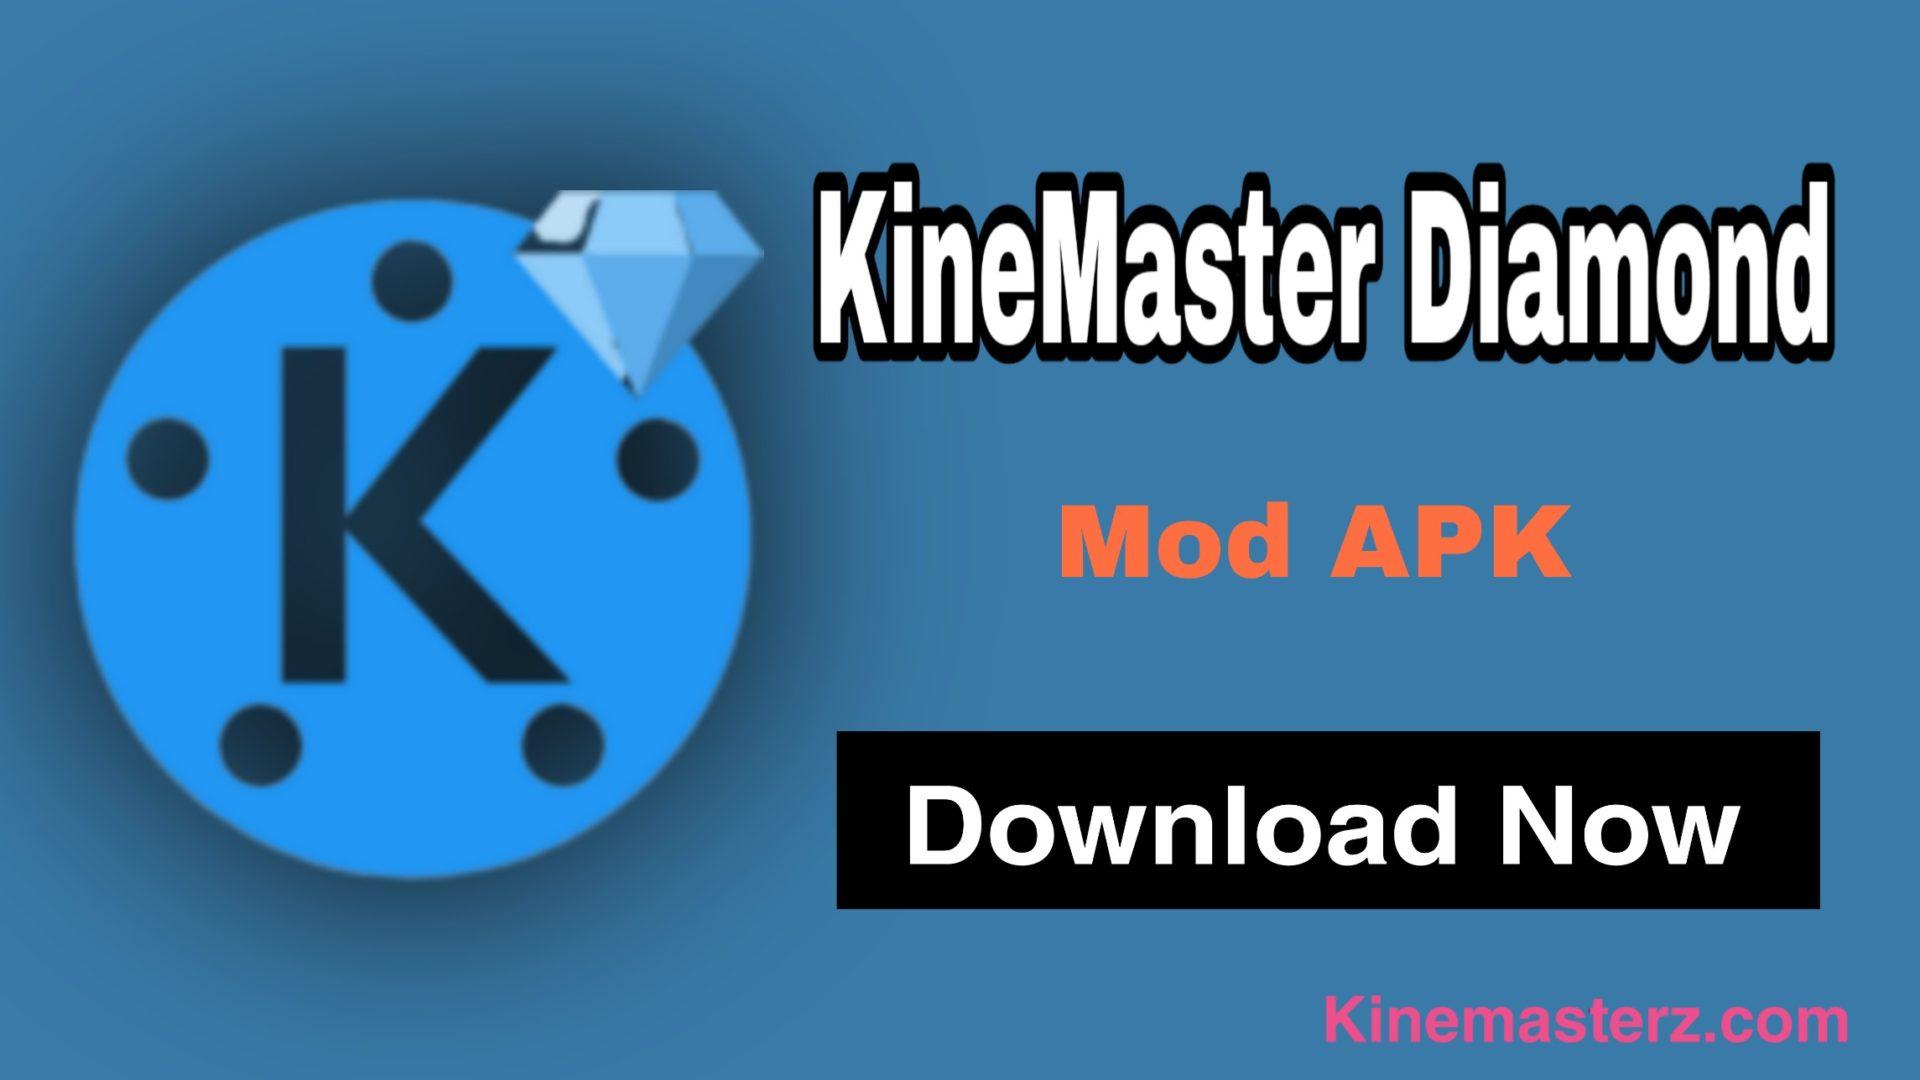 KineMaster Diamond APK (v5.1.14) Download (No Watermark)